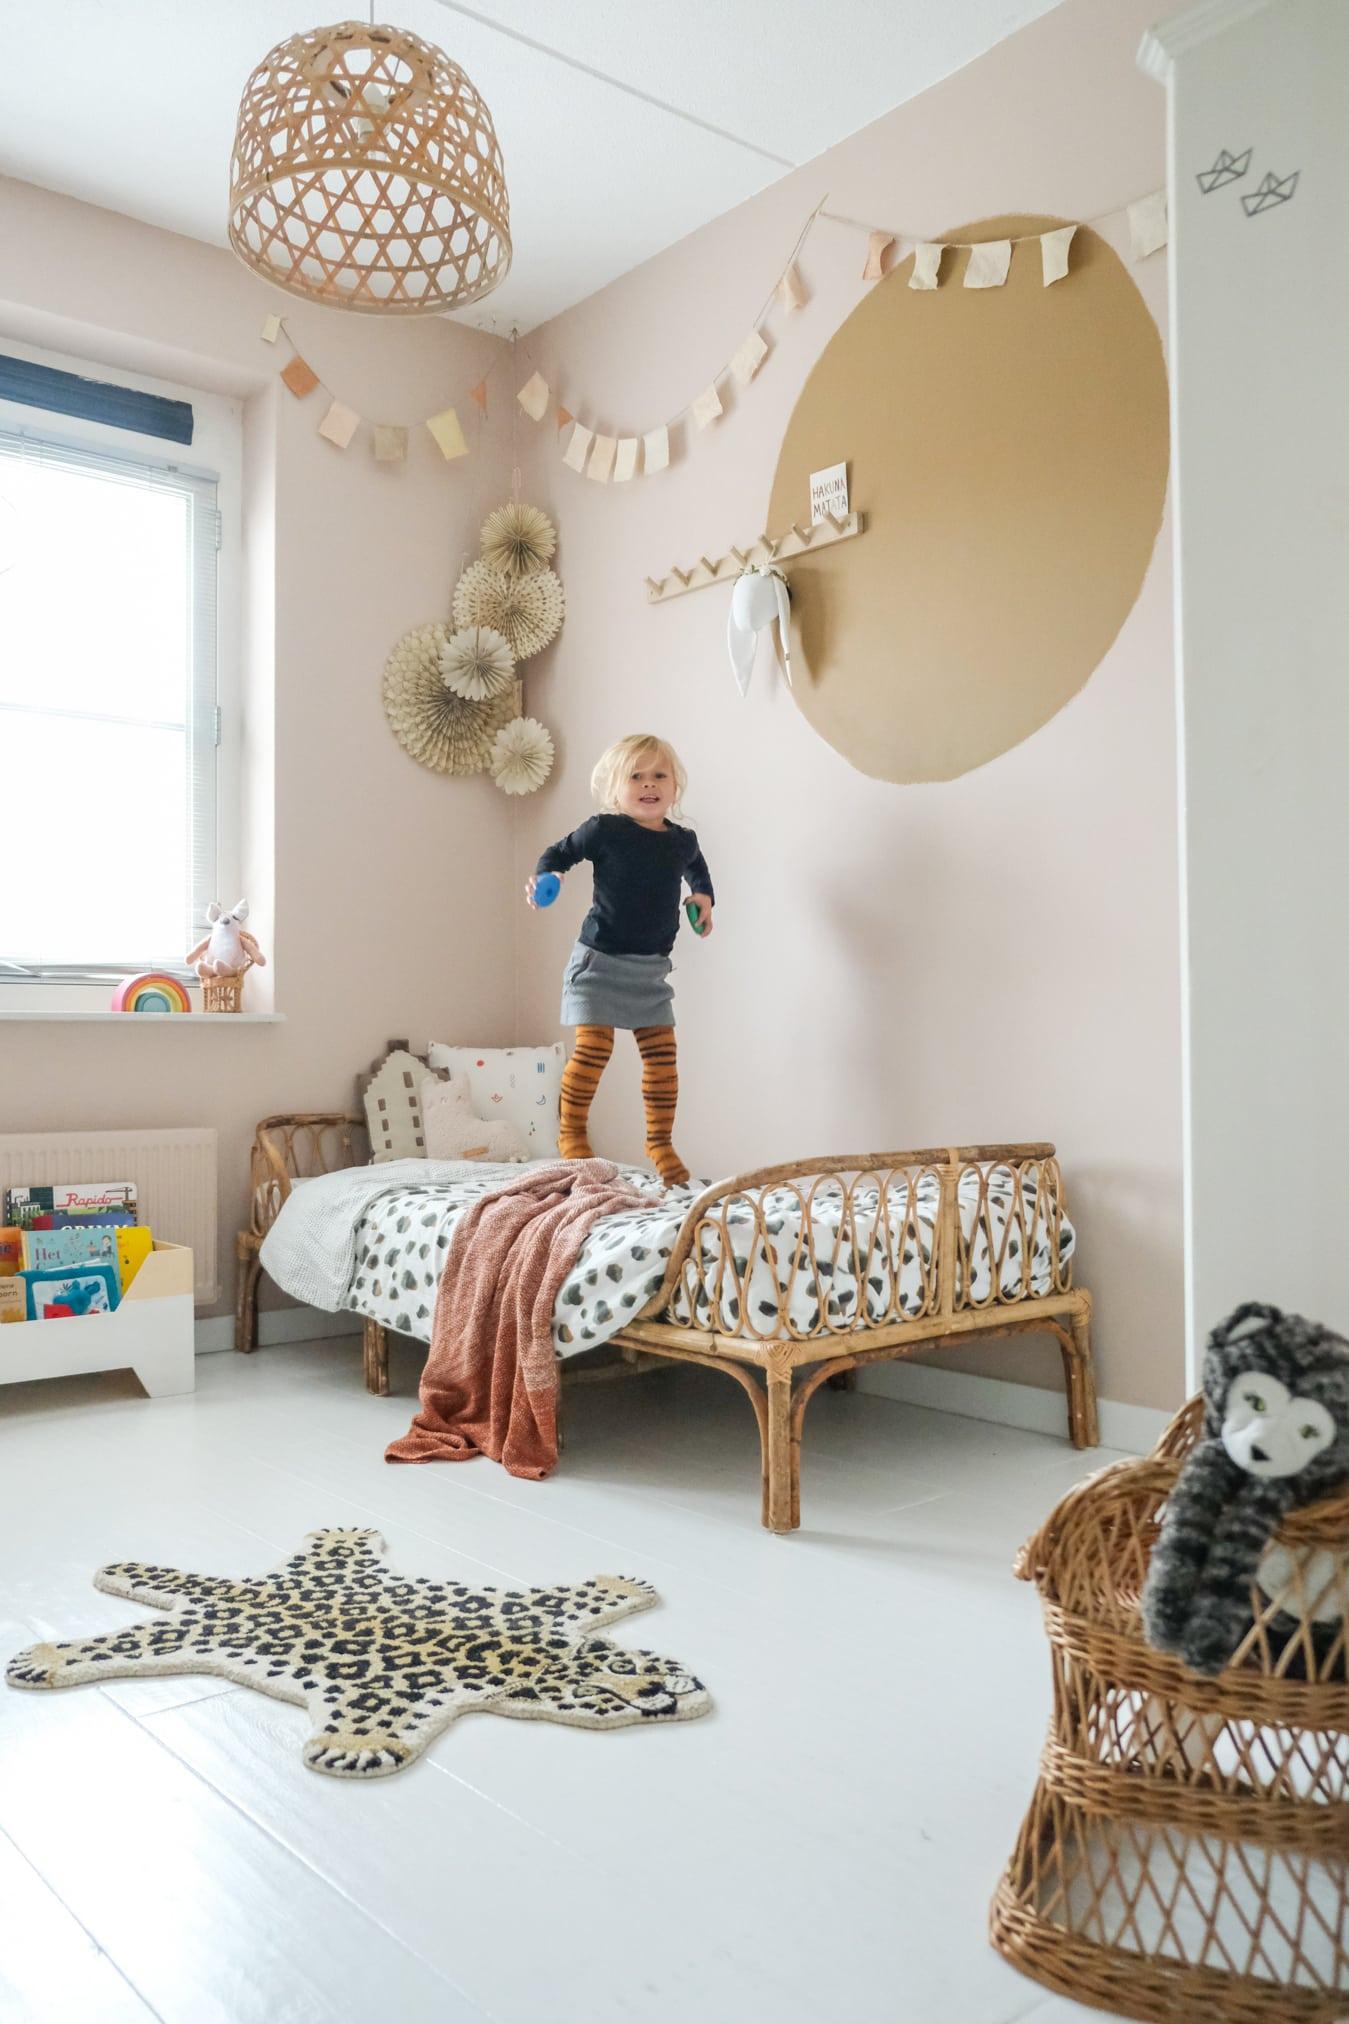 speelgoed hout slaapkamer